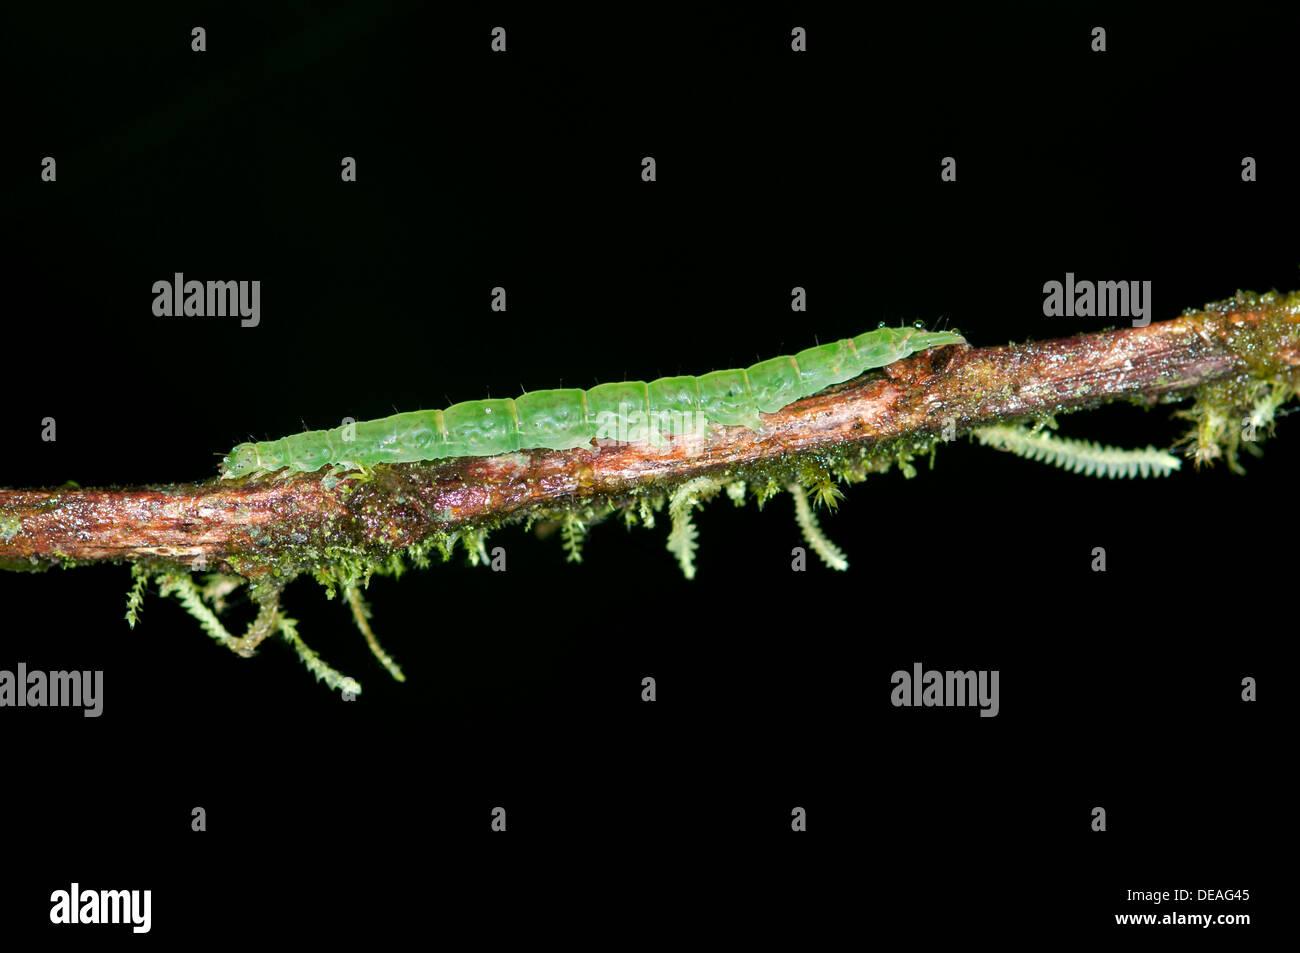 Caterpillar of an Owlet Moth in the genus of Hypena, Noctuidae, Tandayapa region, Andean mist rainforest, Ecuador, South America - Stock Image